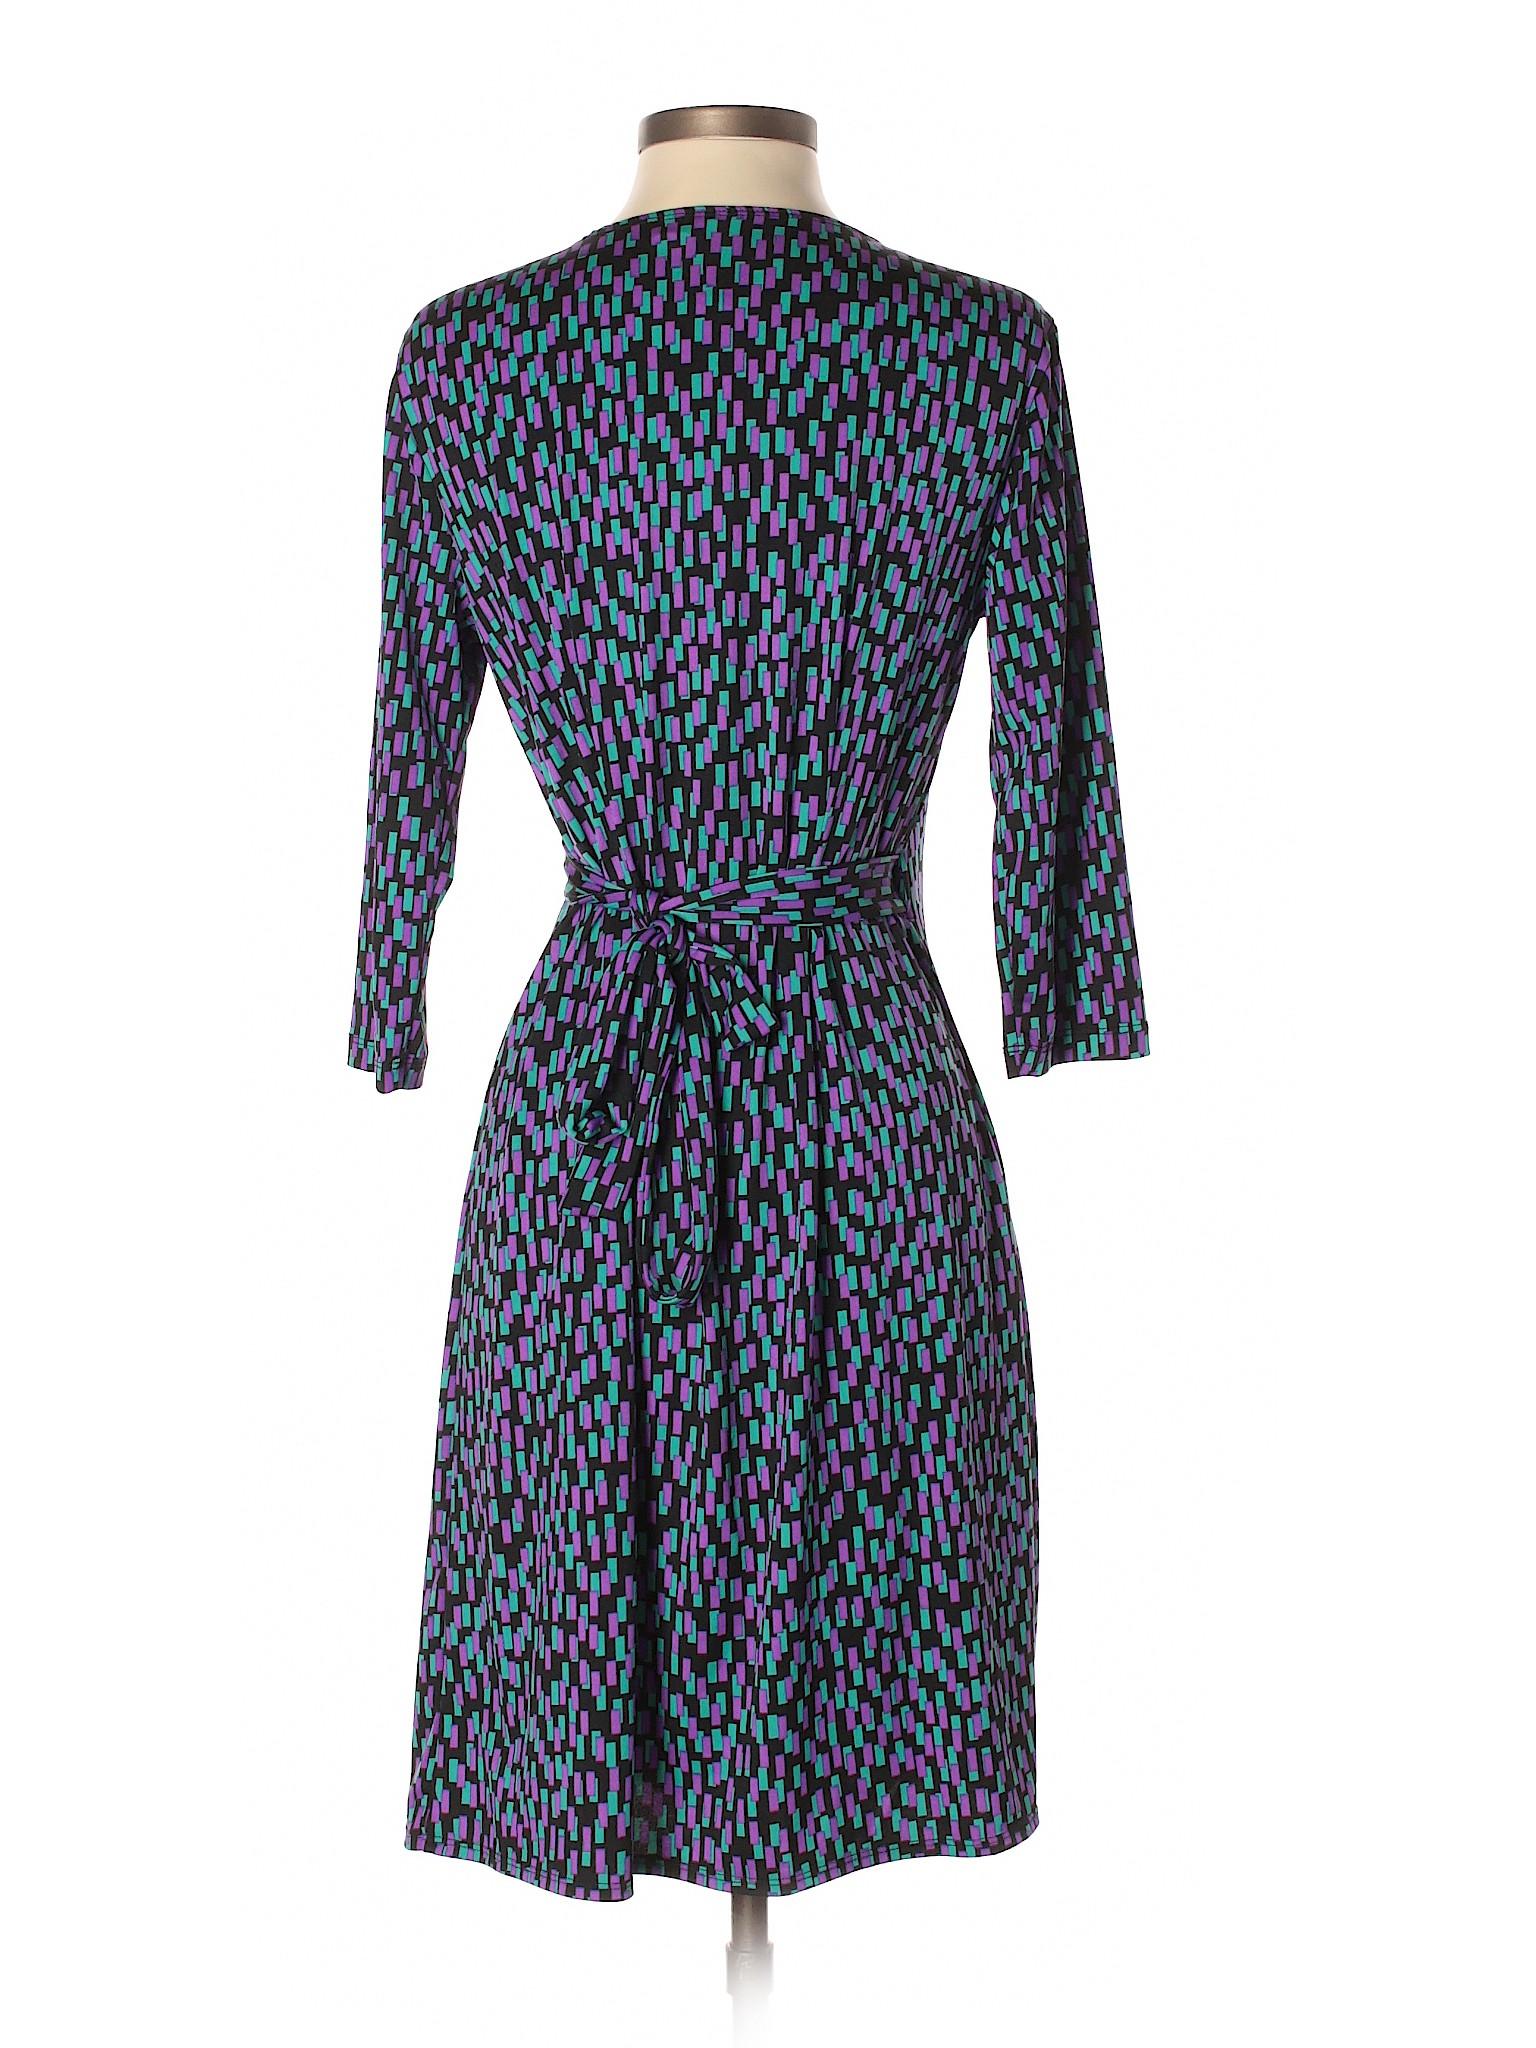 Casual Michele amp; Dress Winter Boutique Emma xqCIw6PcT